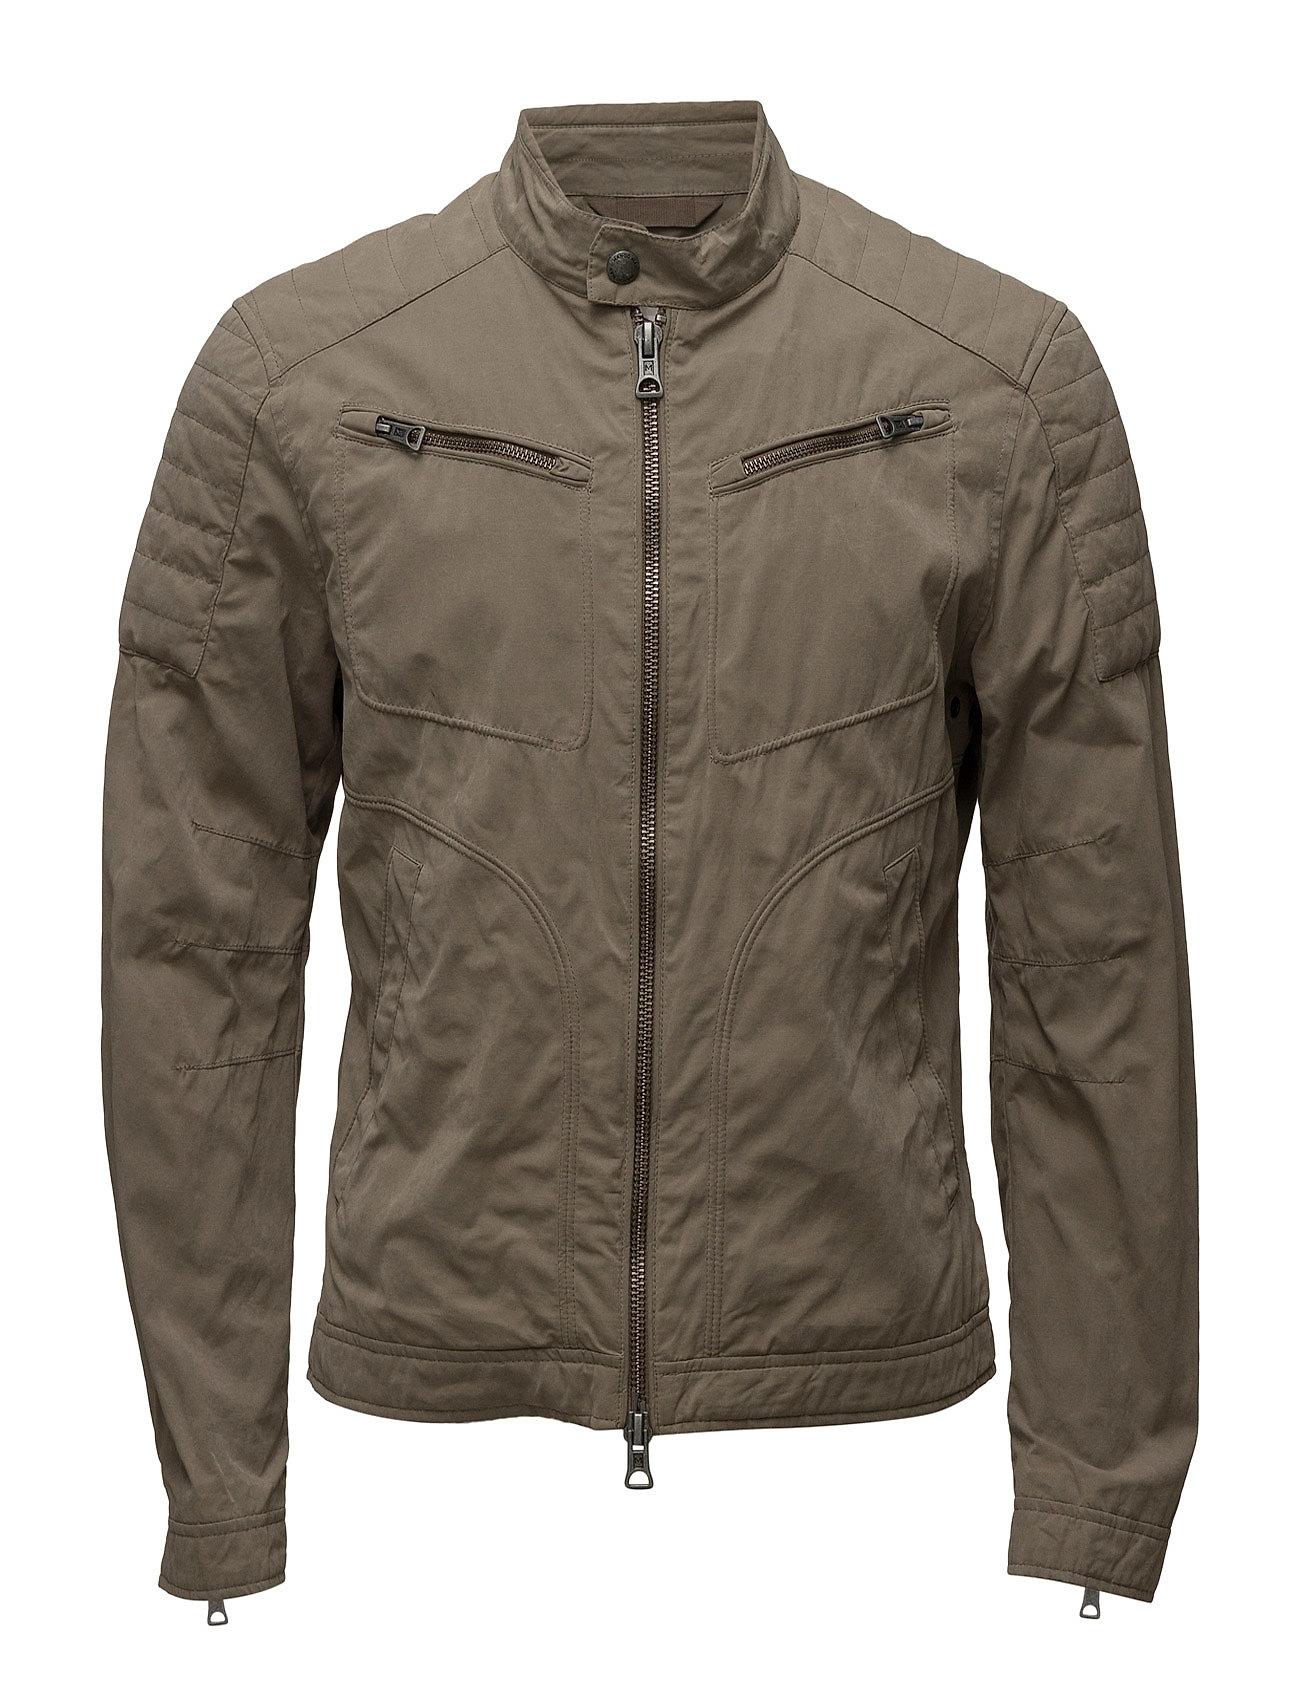 Cotton Nylon-Blend Jacket Mango Man Jakker til Herrer i Beige - Khaki